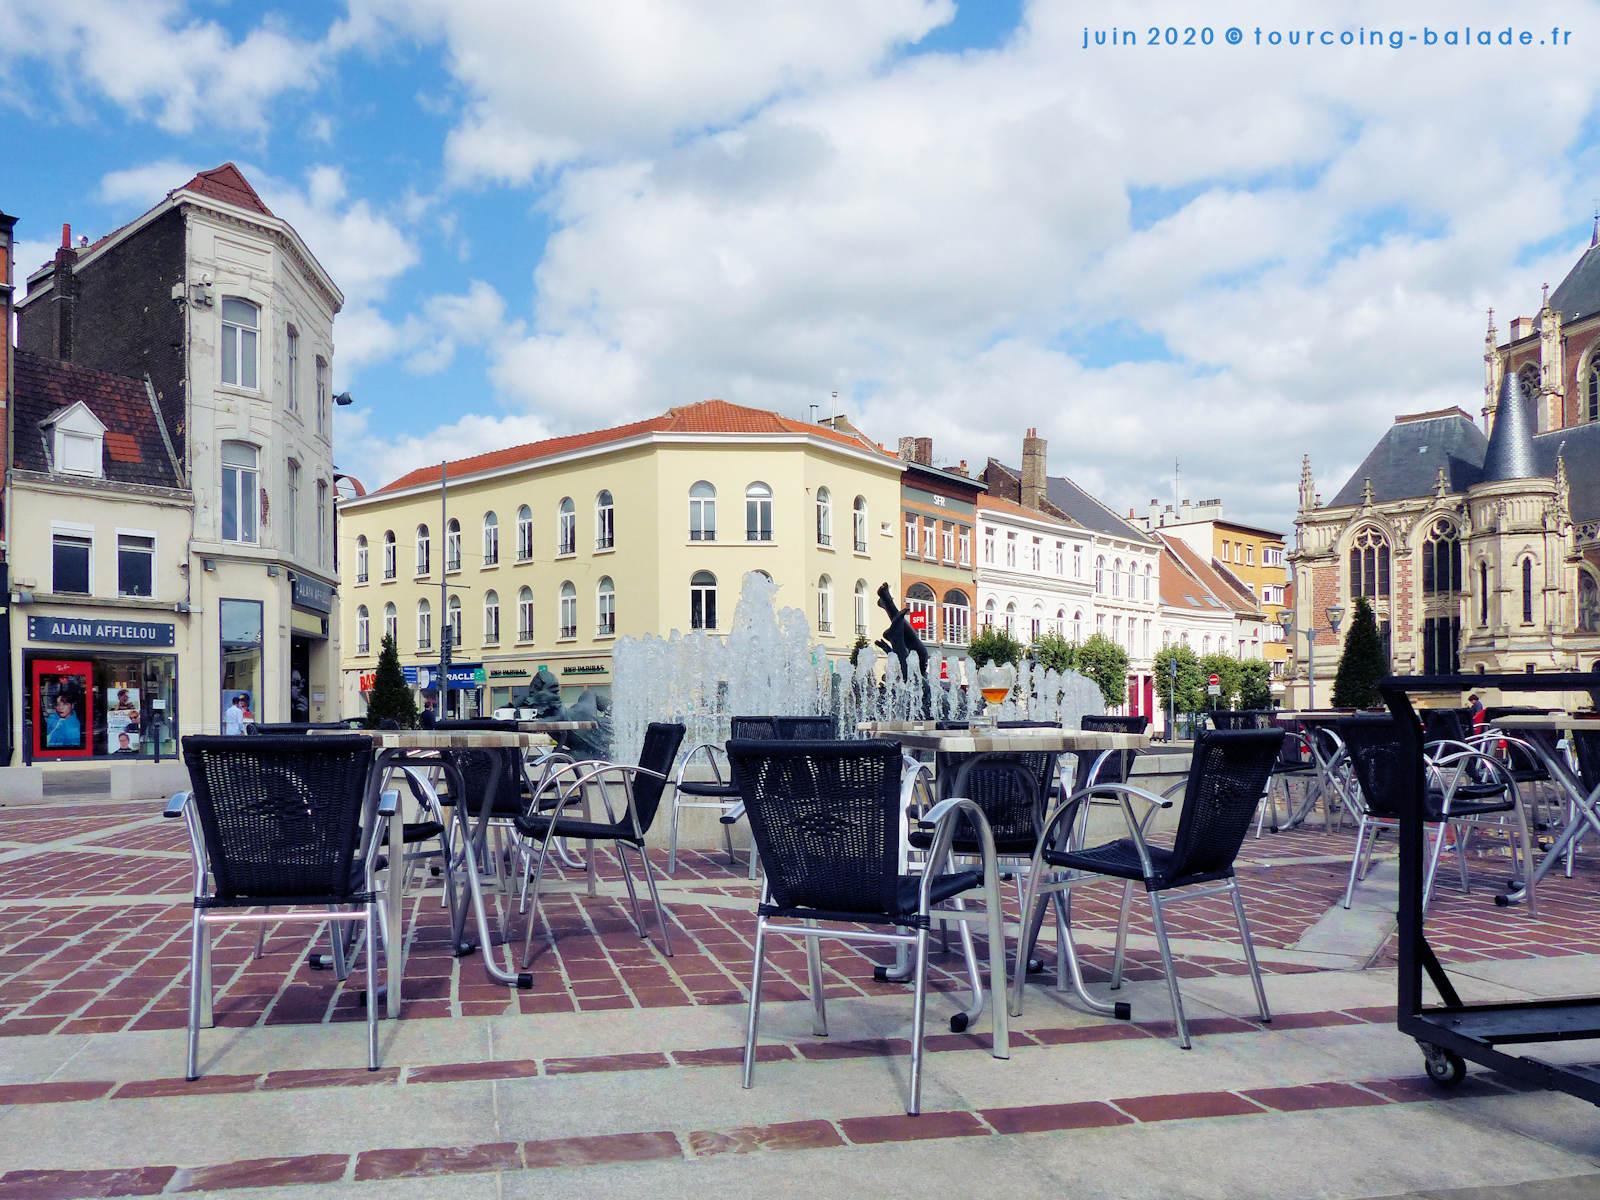 Bar Café L'Abbaye, Tourcoing Grand Place, 2020